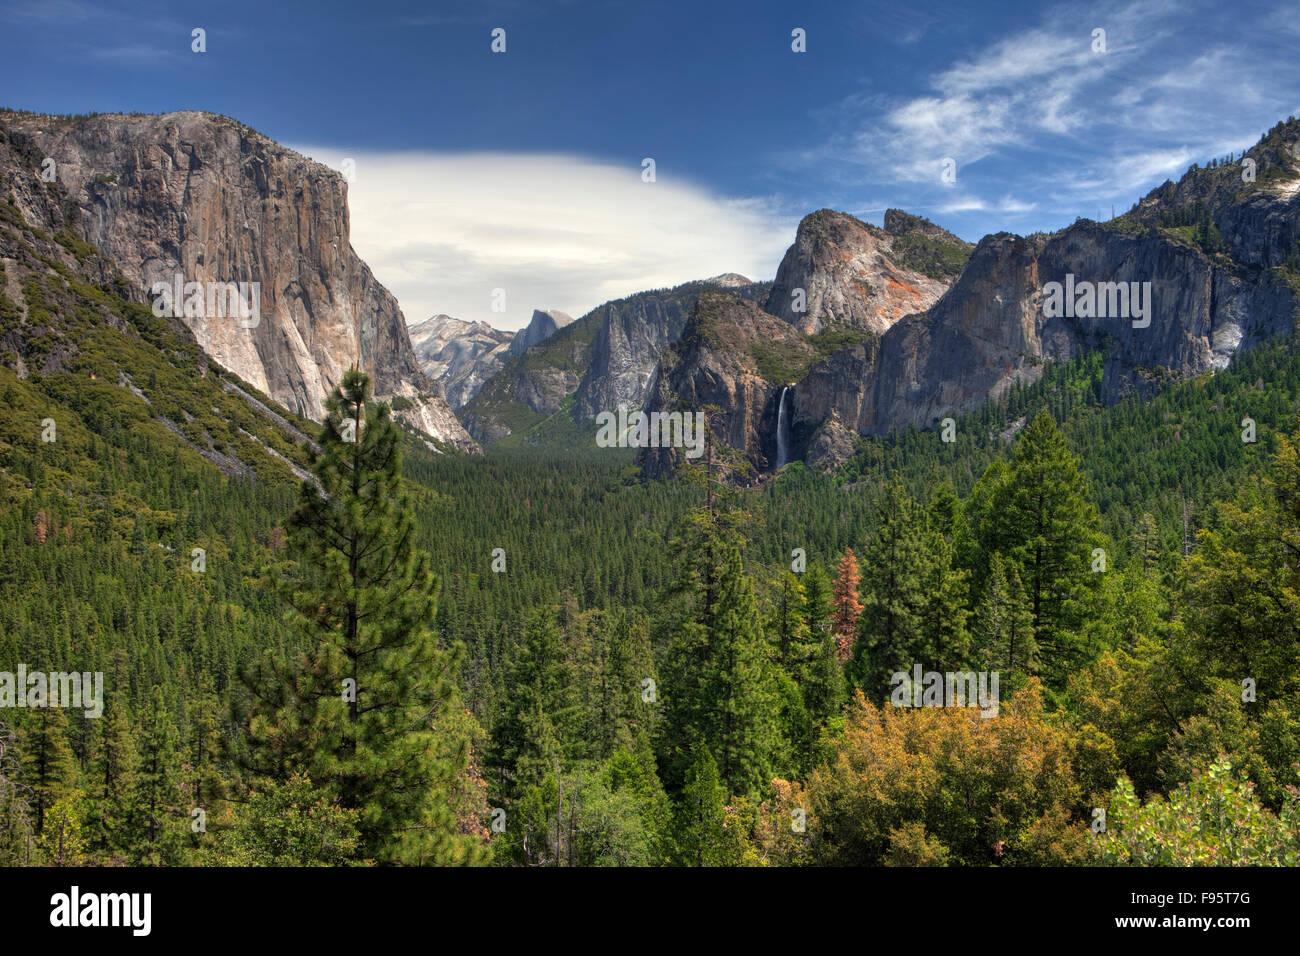 Yosemite National Park, Calif. USA Stock Photo